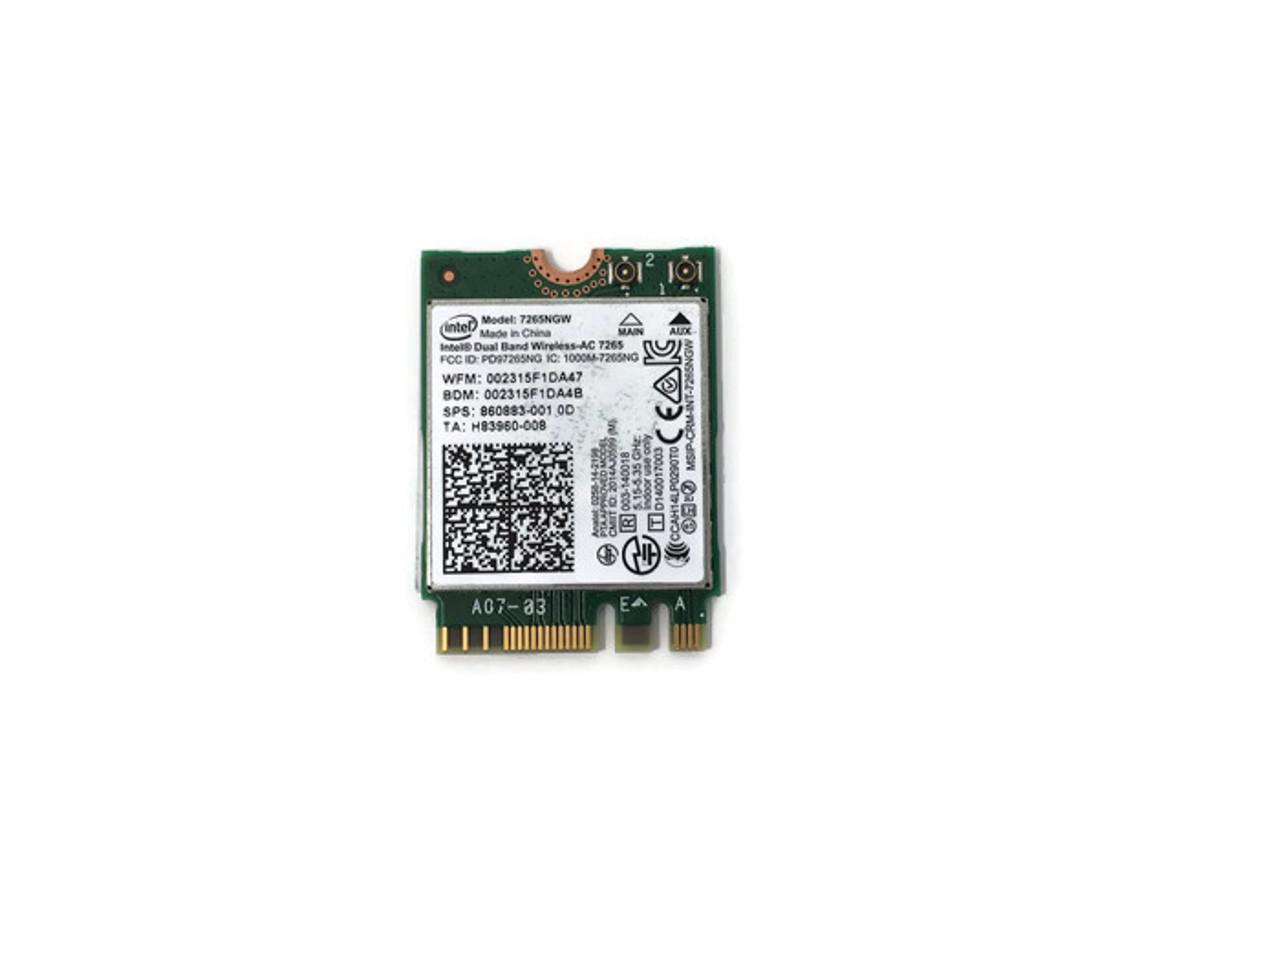 Intel Dual Band Wireless - 802.11ac, Dual Band, Wi-Fi + Bluetooth 4.0